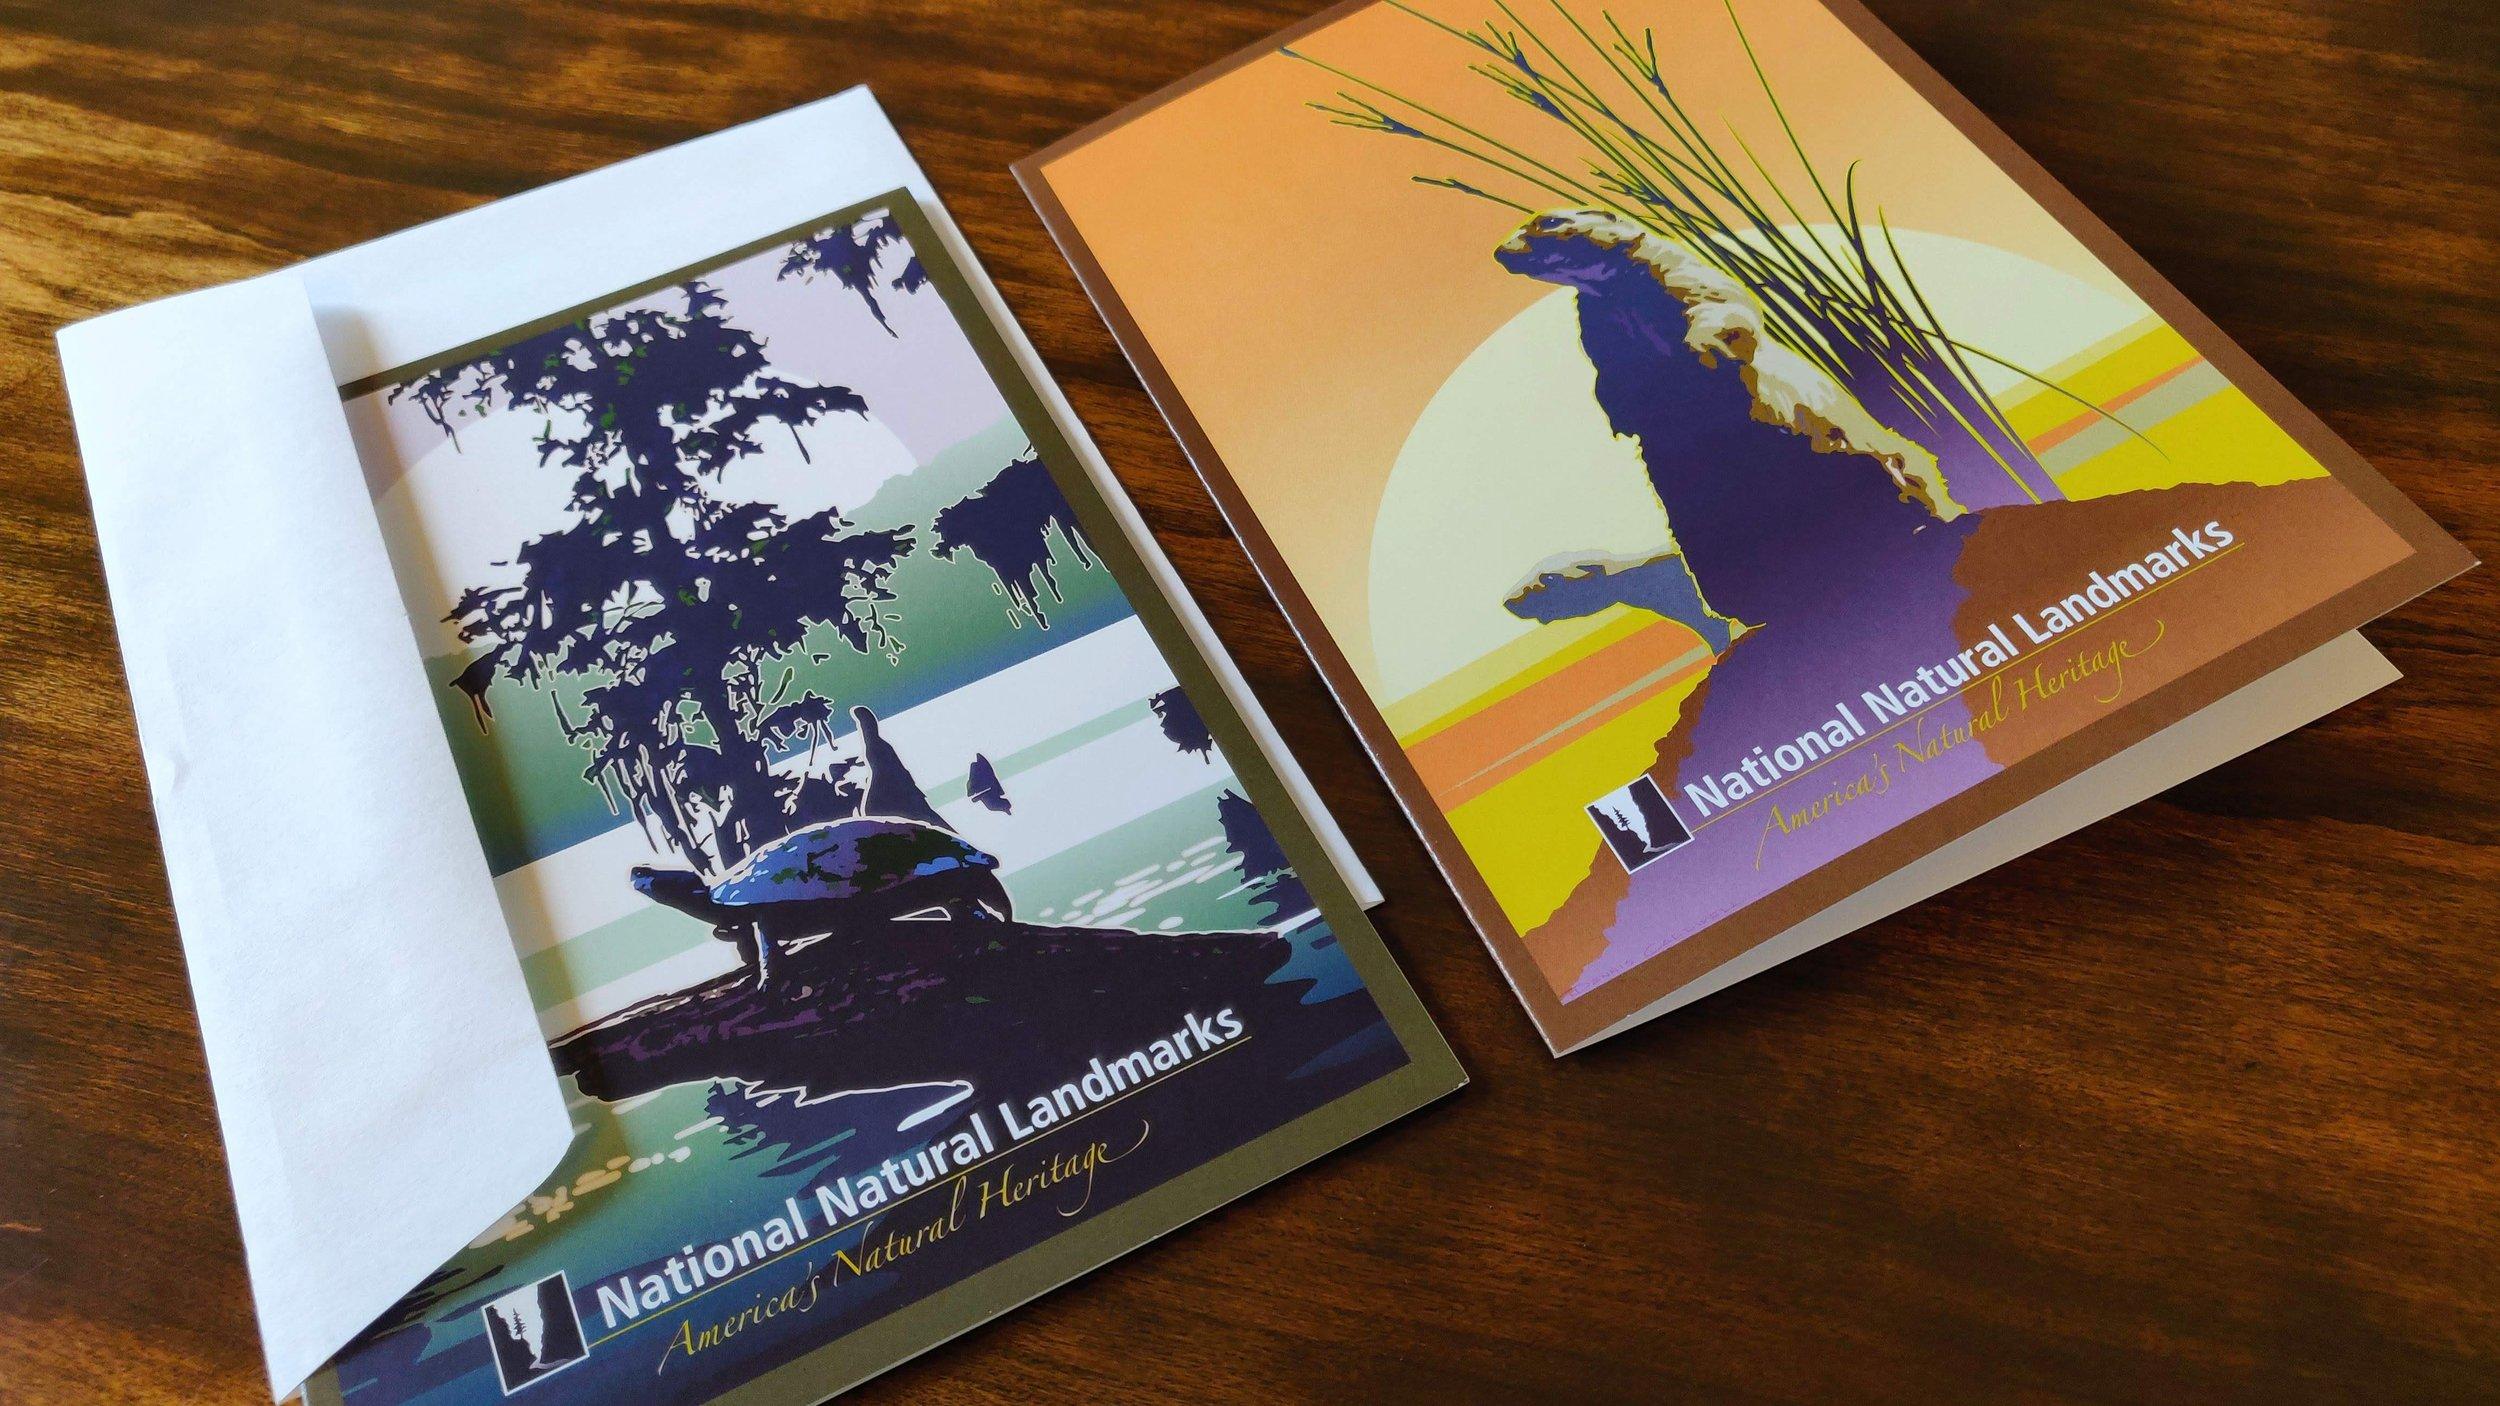 National Natural Landmarks Note Cards